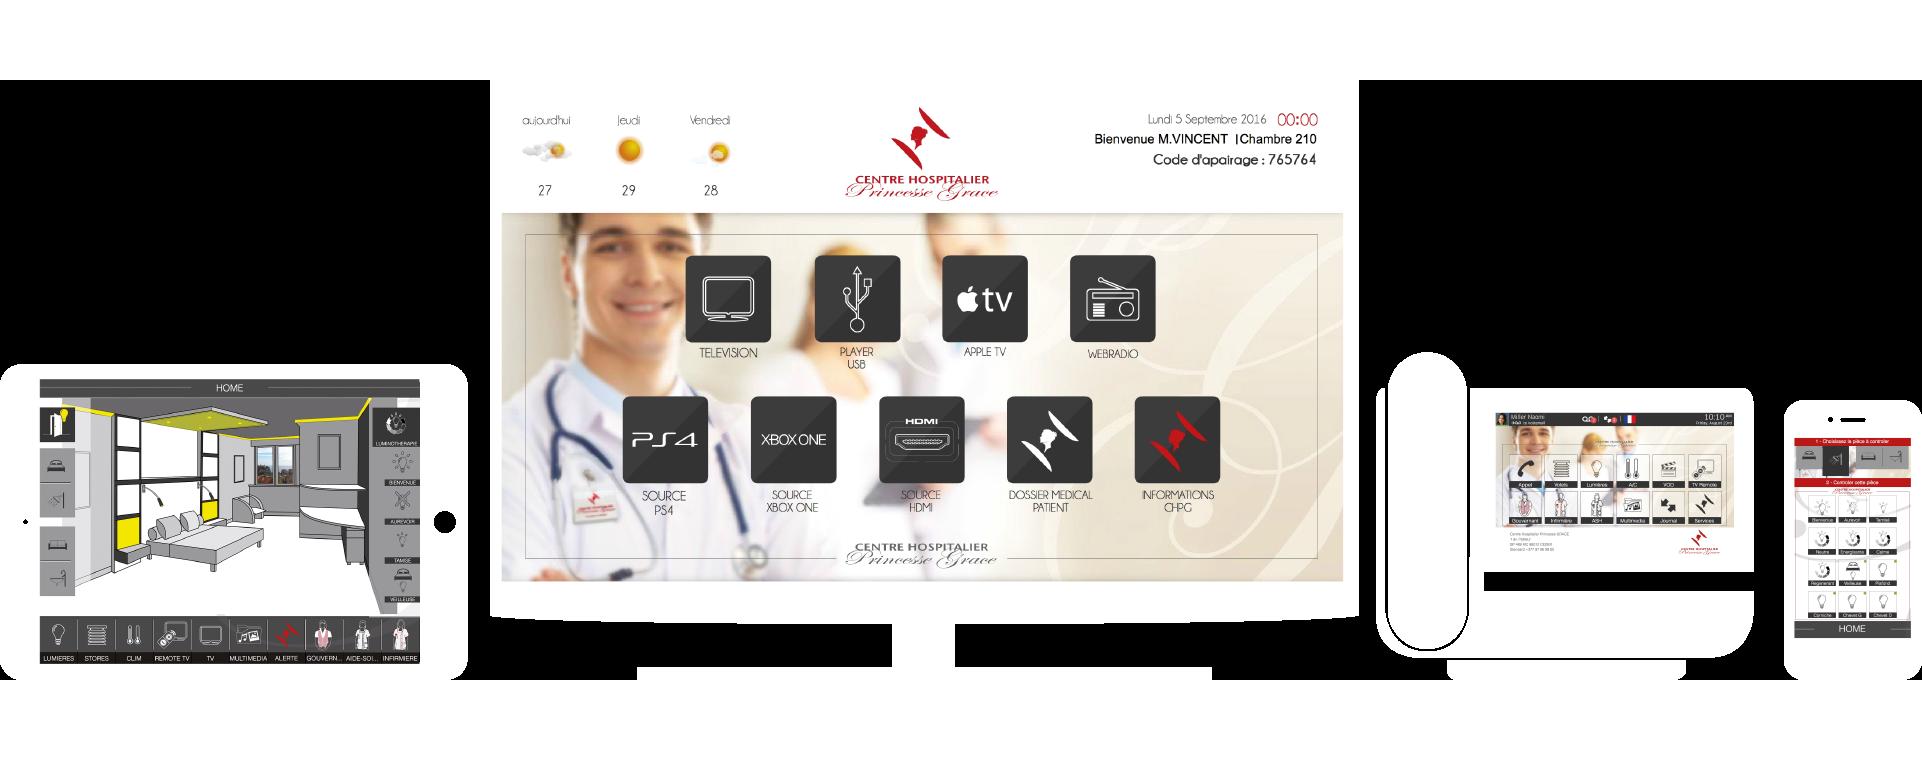 easyone-ghx-healthcare-computeur